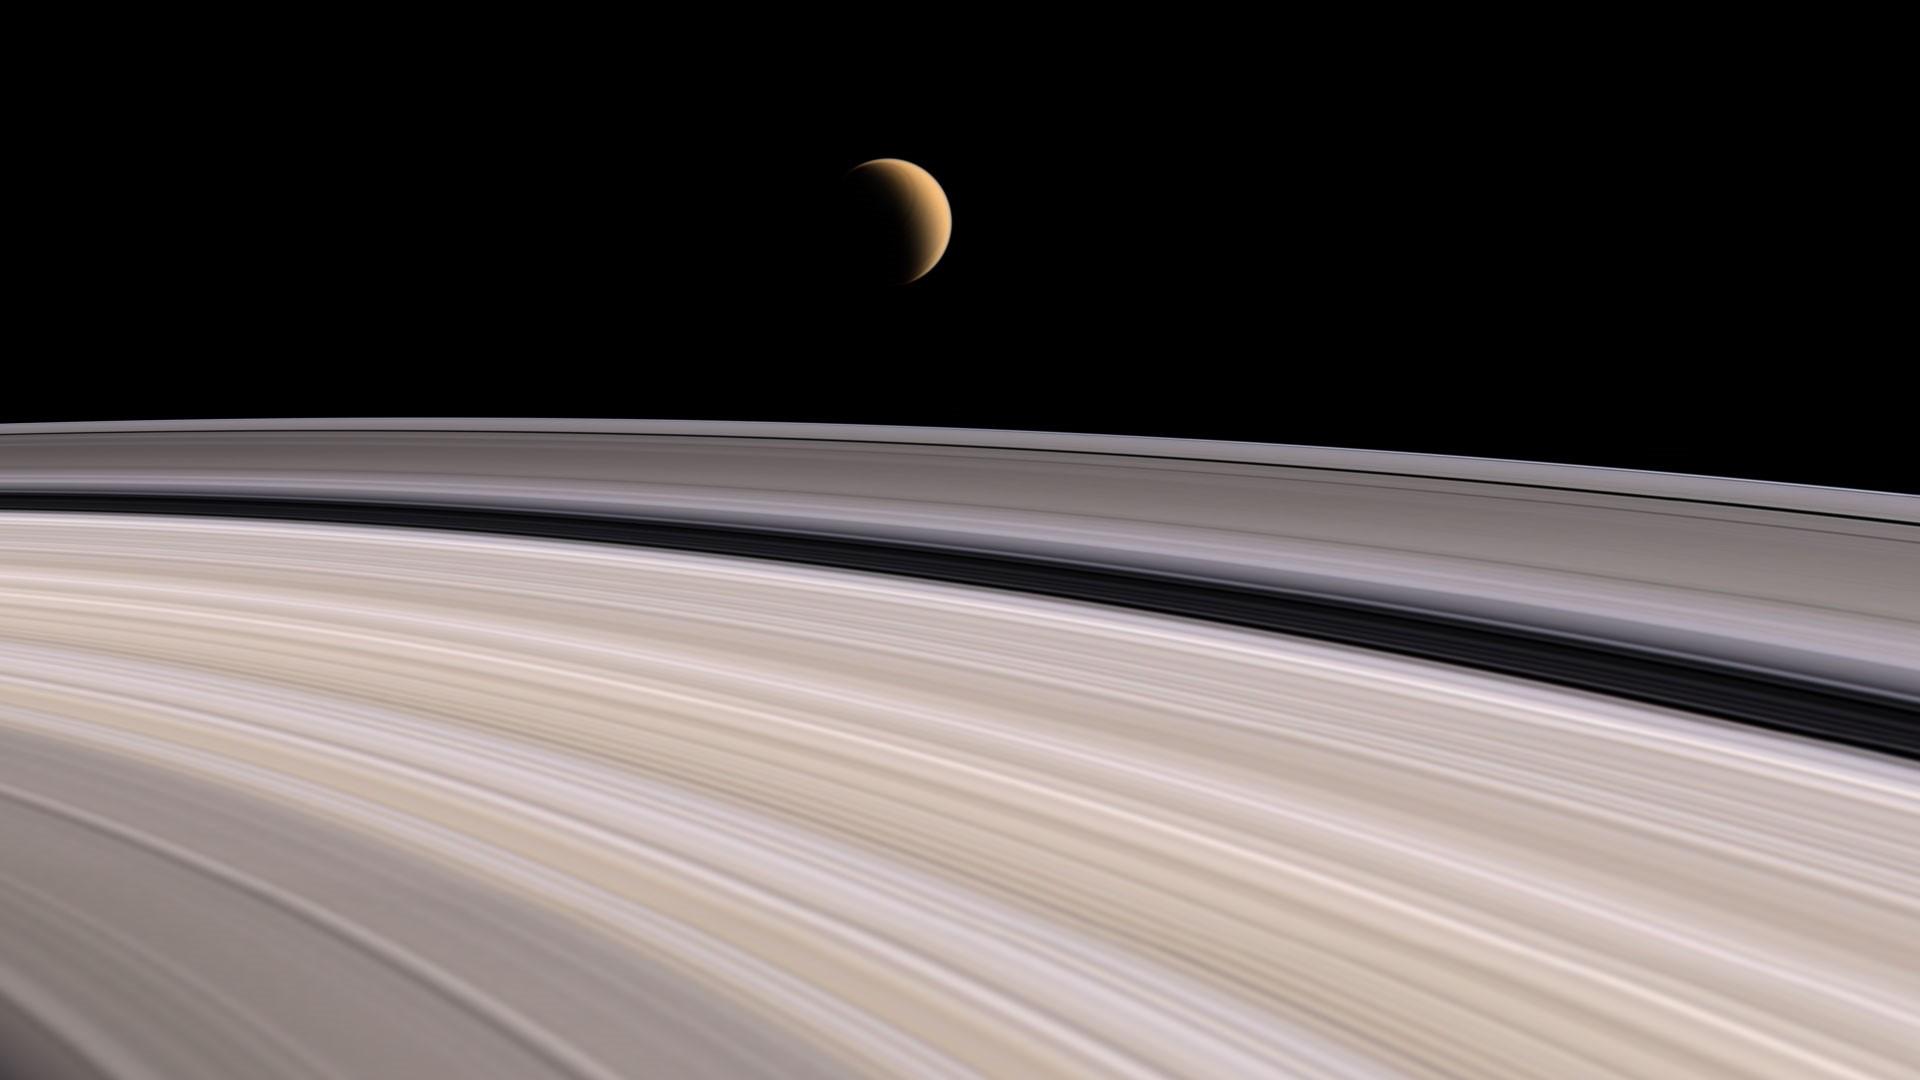 Saturn full wallpaper